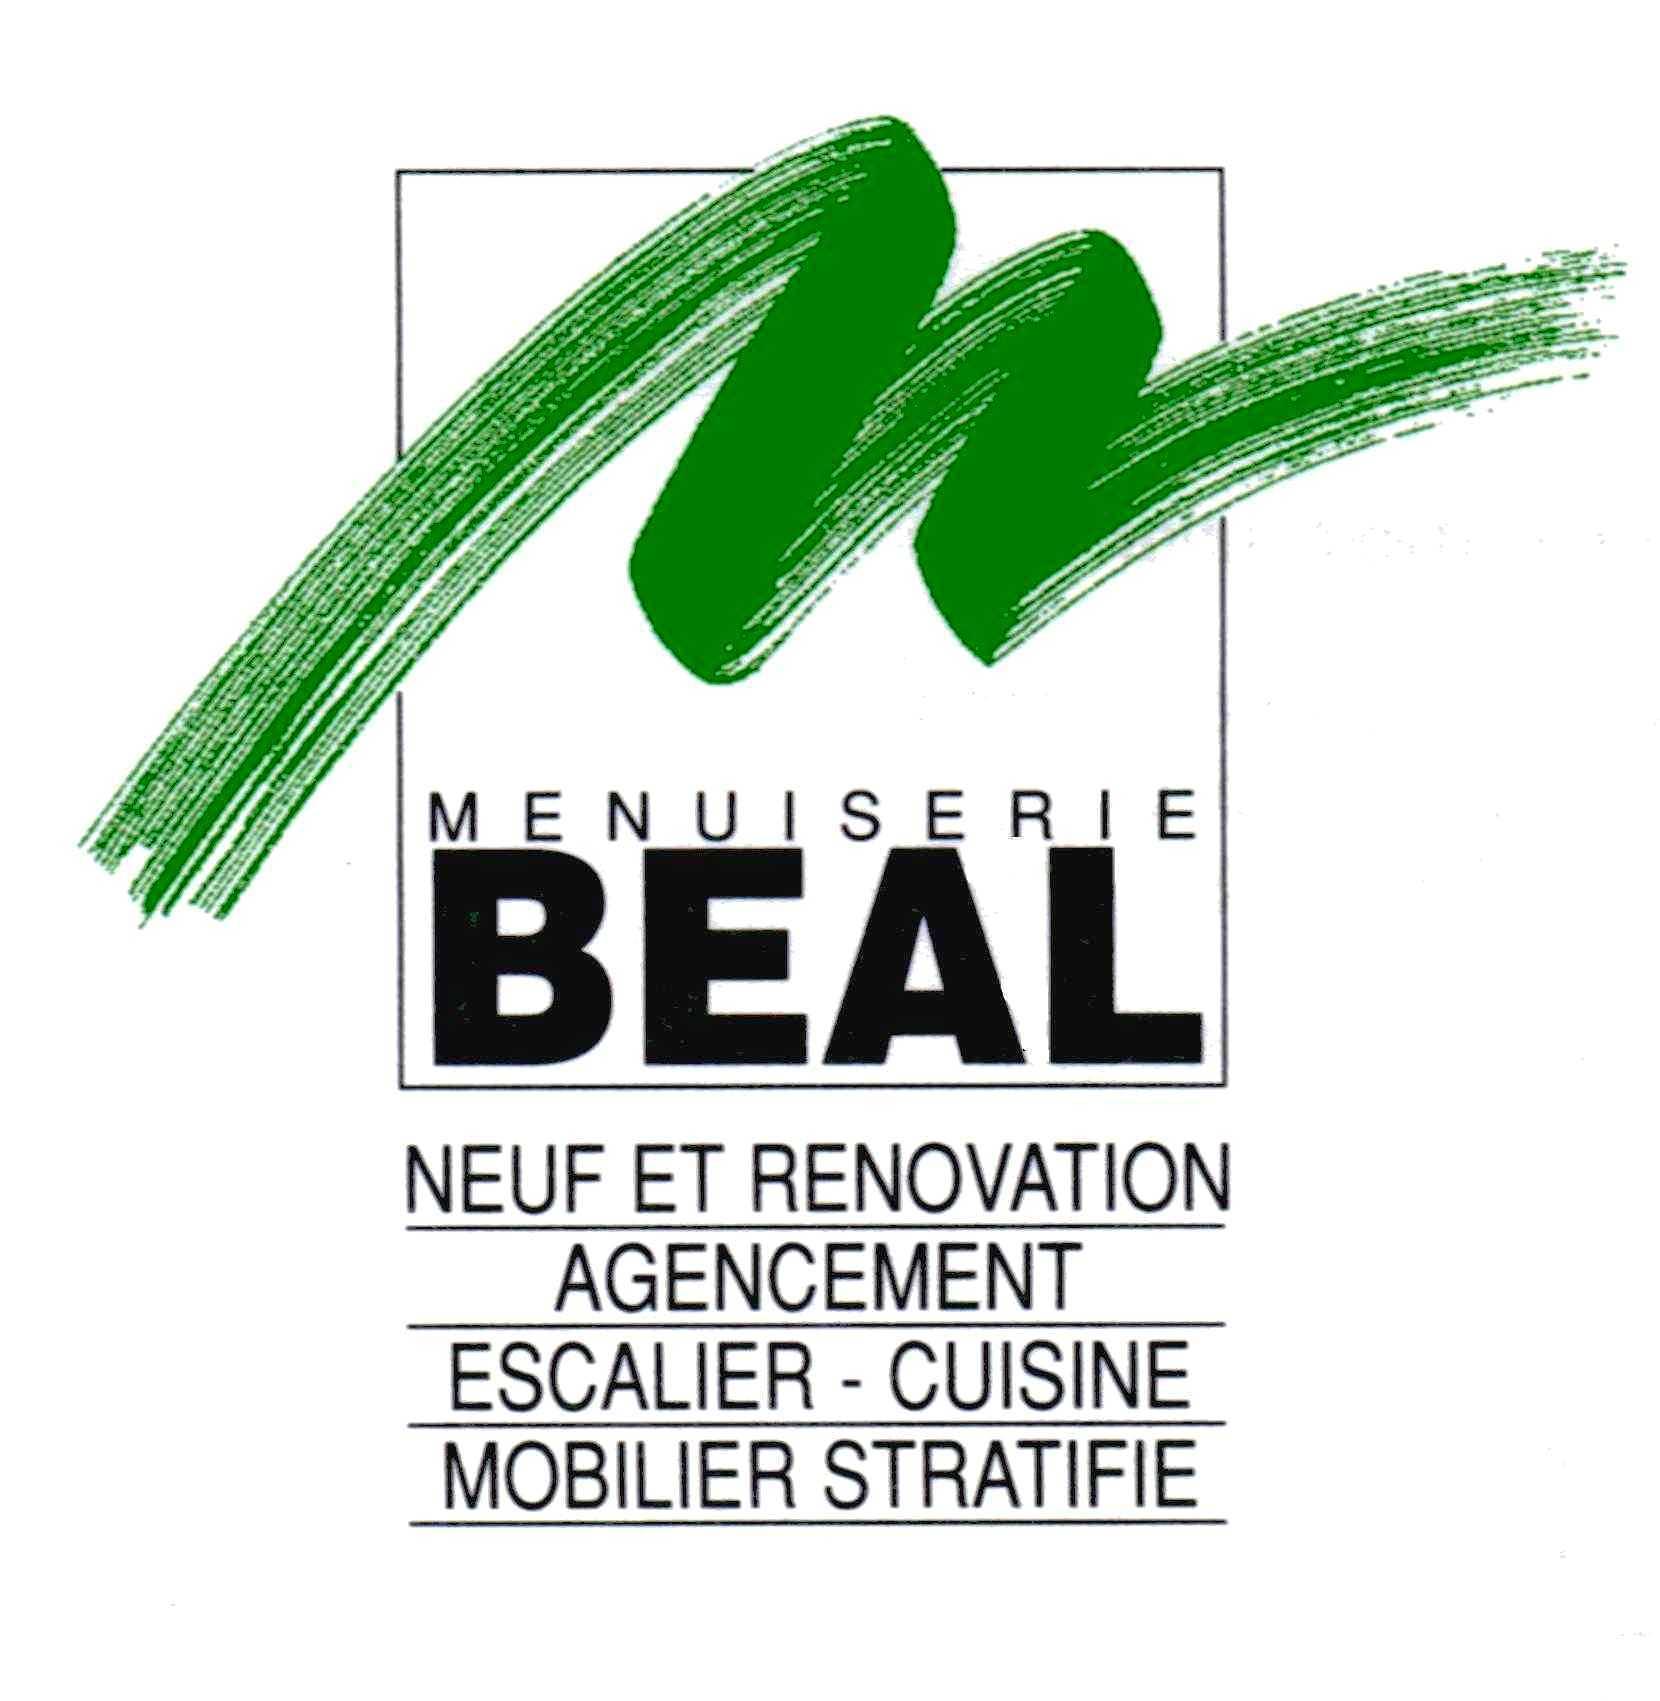 Béal Menuiserie